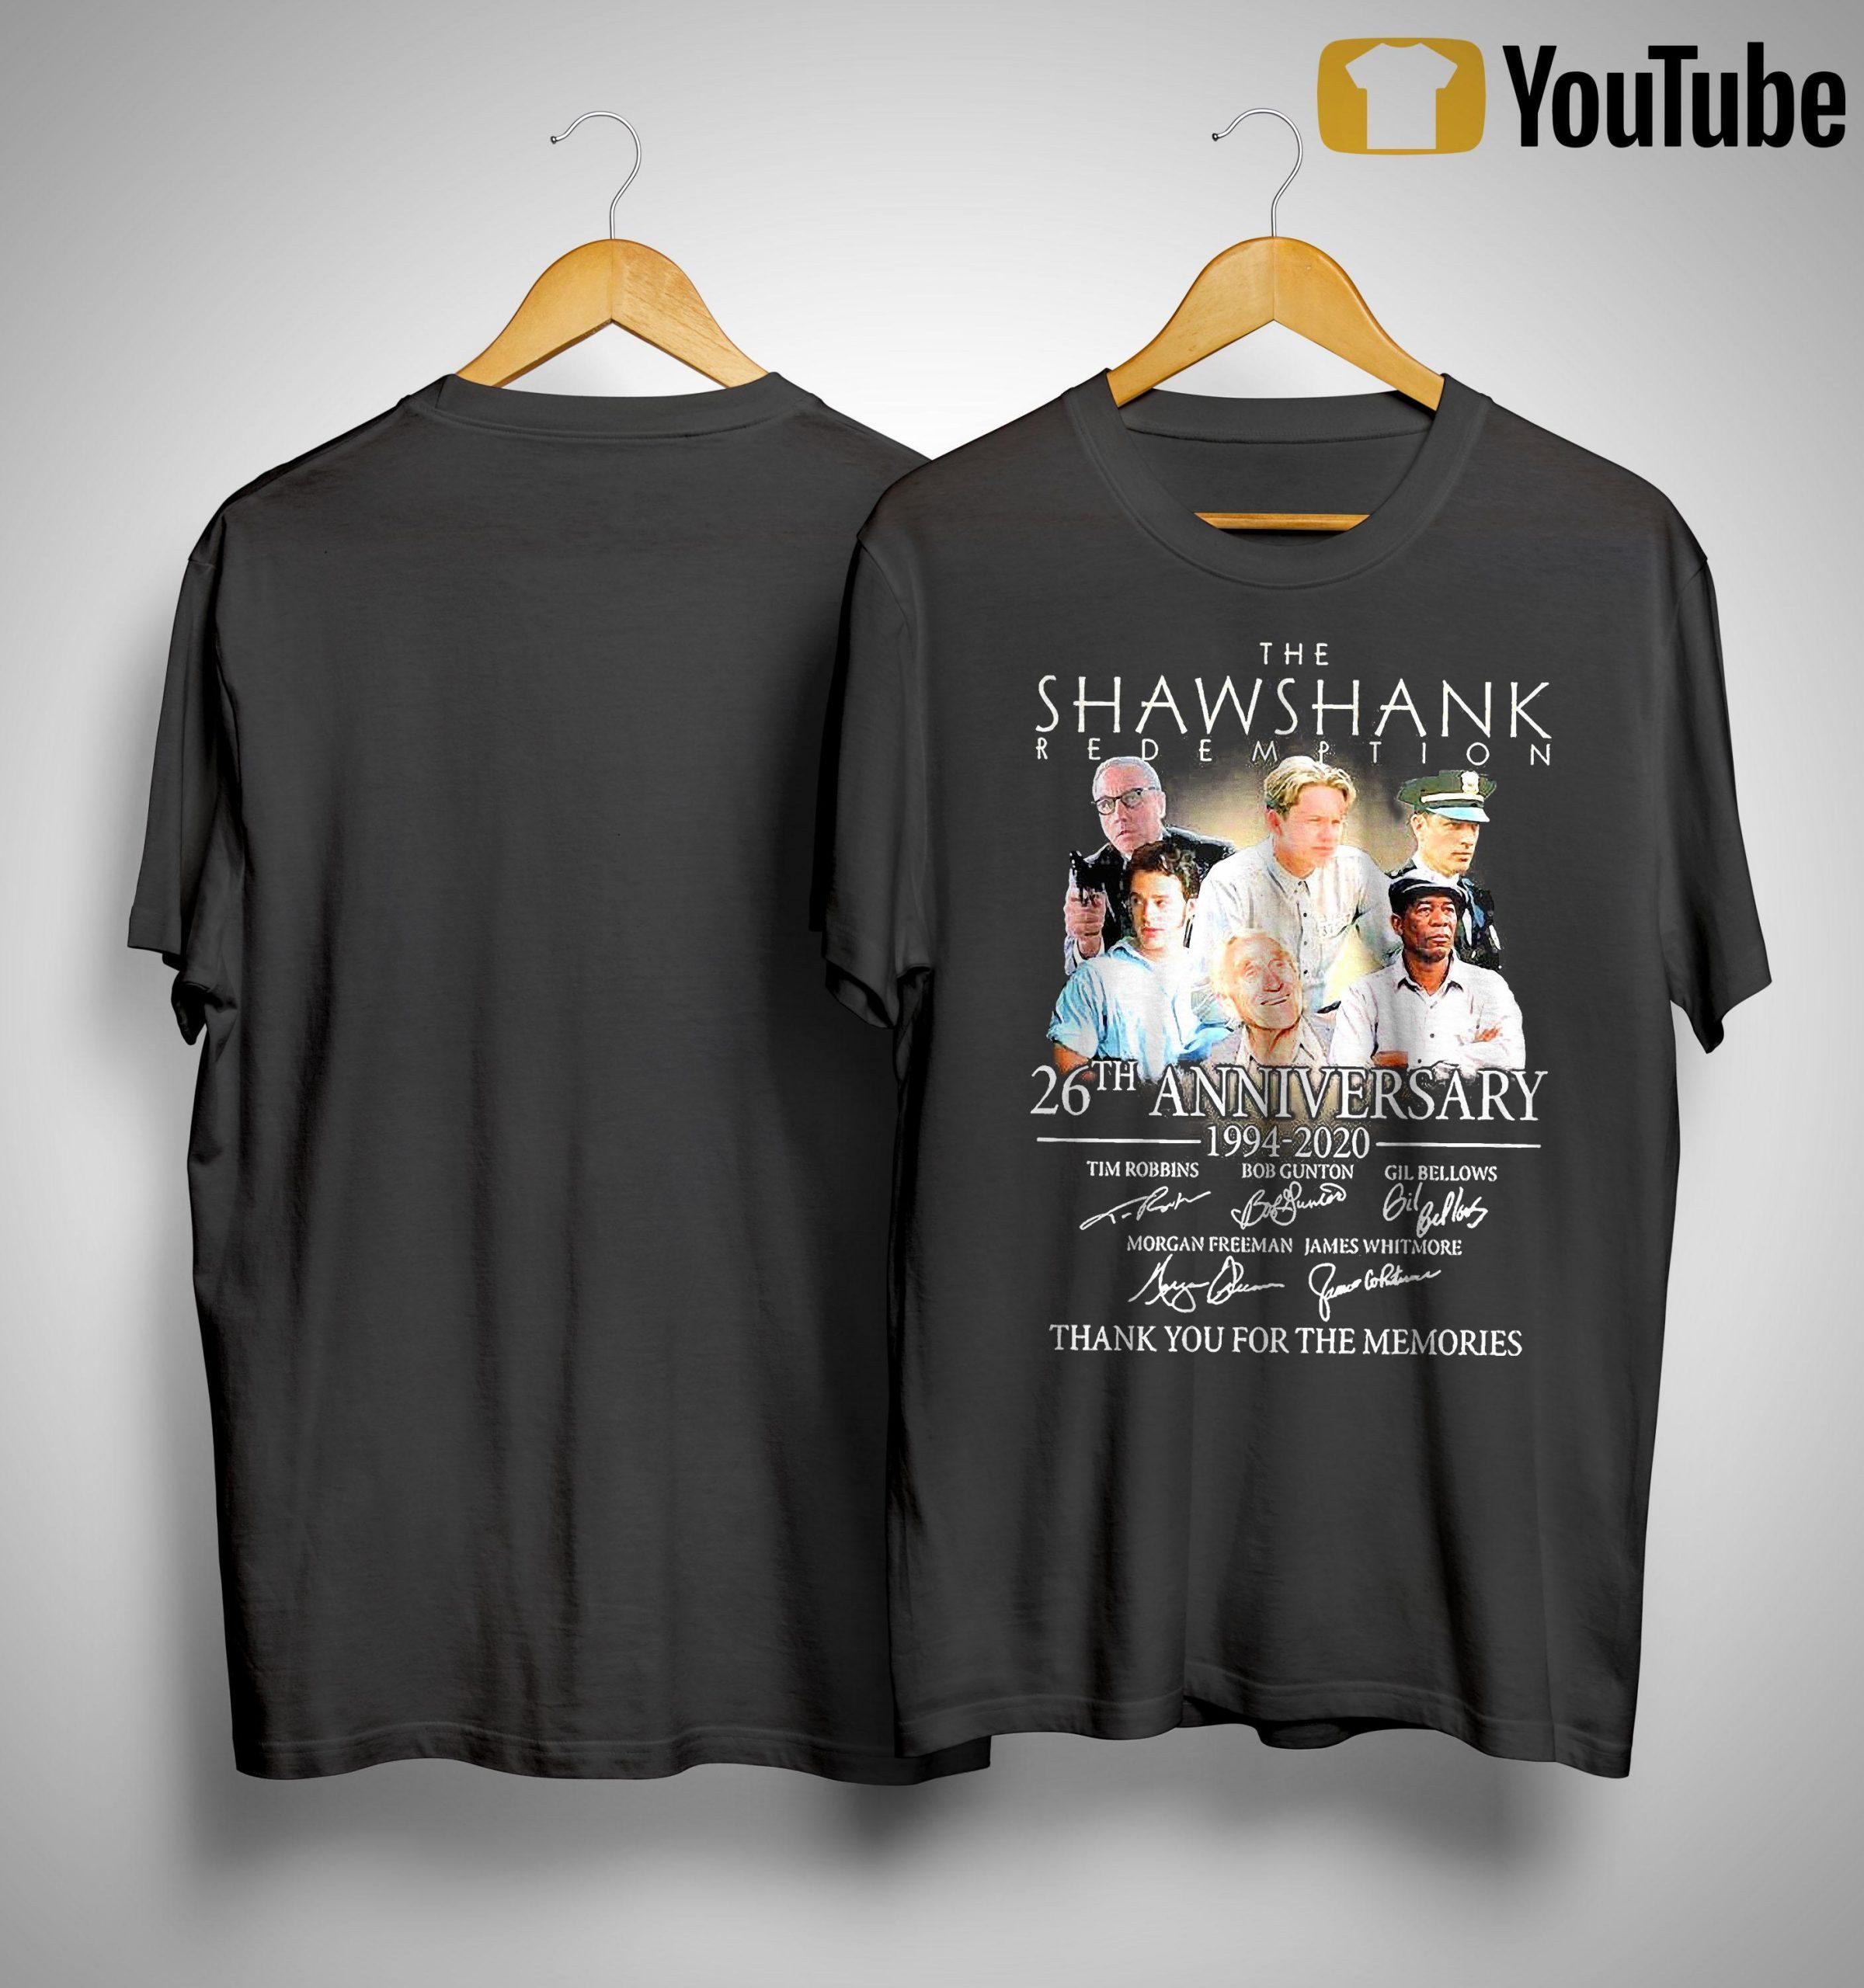 The Shawshank Redemption 26th Anniversary 1994 2020 Signature Shirt